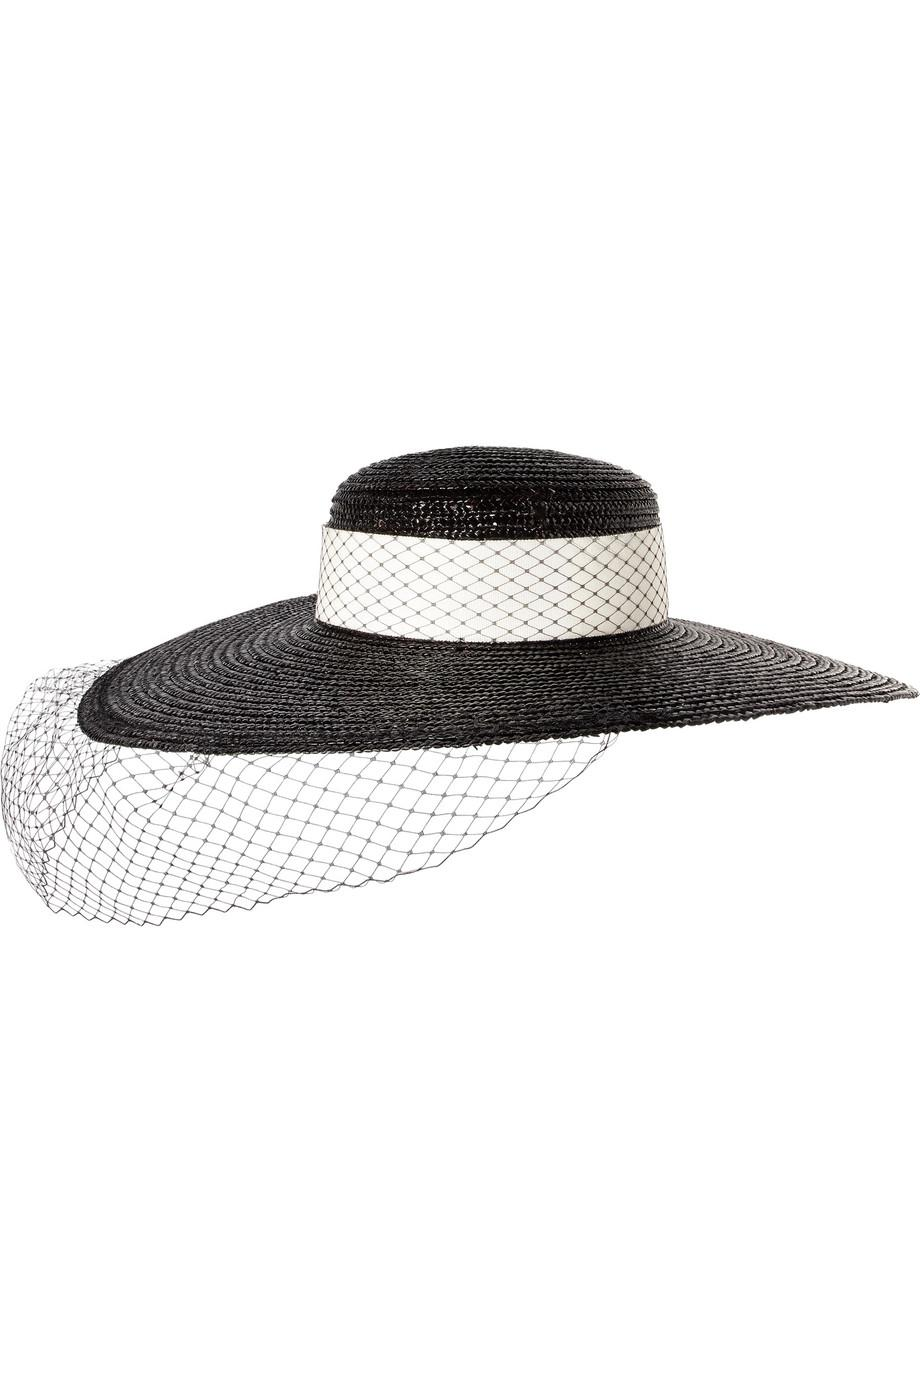 Lettie Grosgrain-trimmed Striped Straw Boater - Black Eugenia Kim Gej3Nts2O